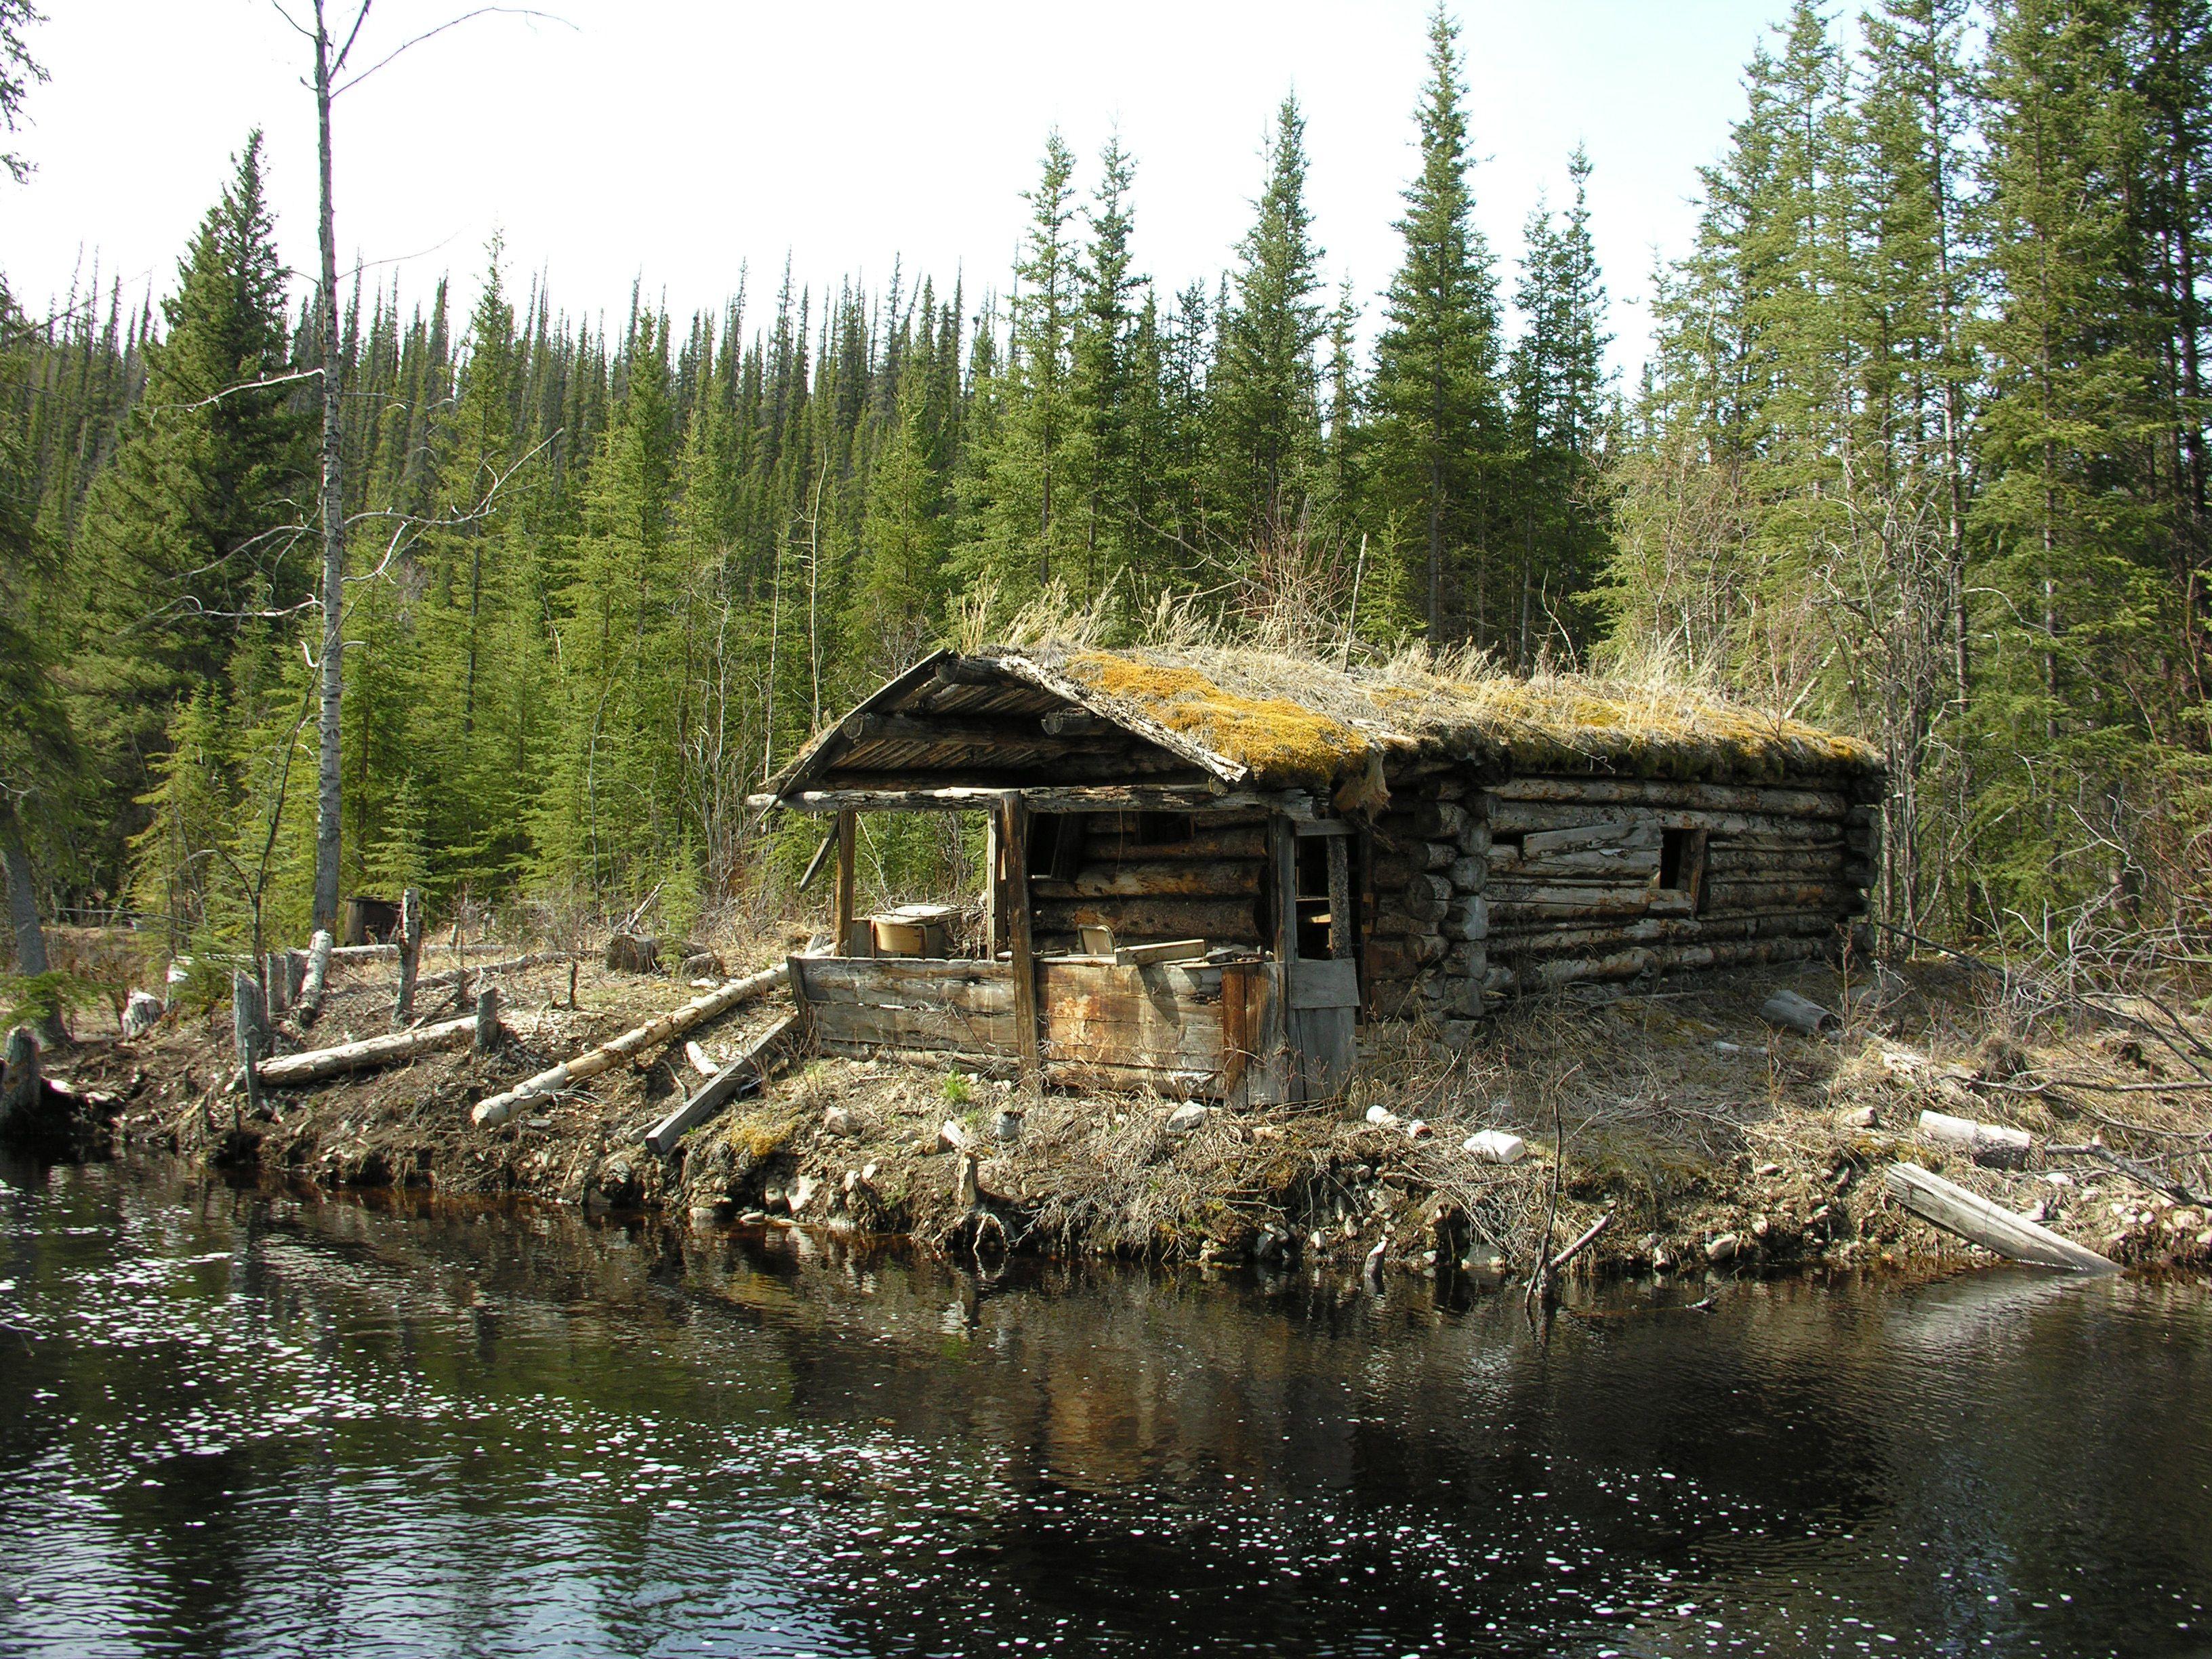 Old Log Cabin cabin forest log cabin old river trees woods 3264x2448